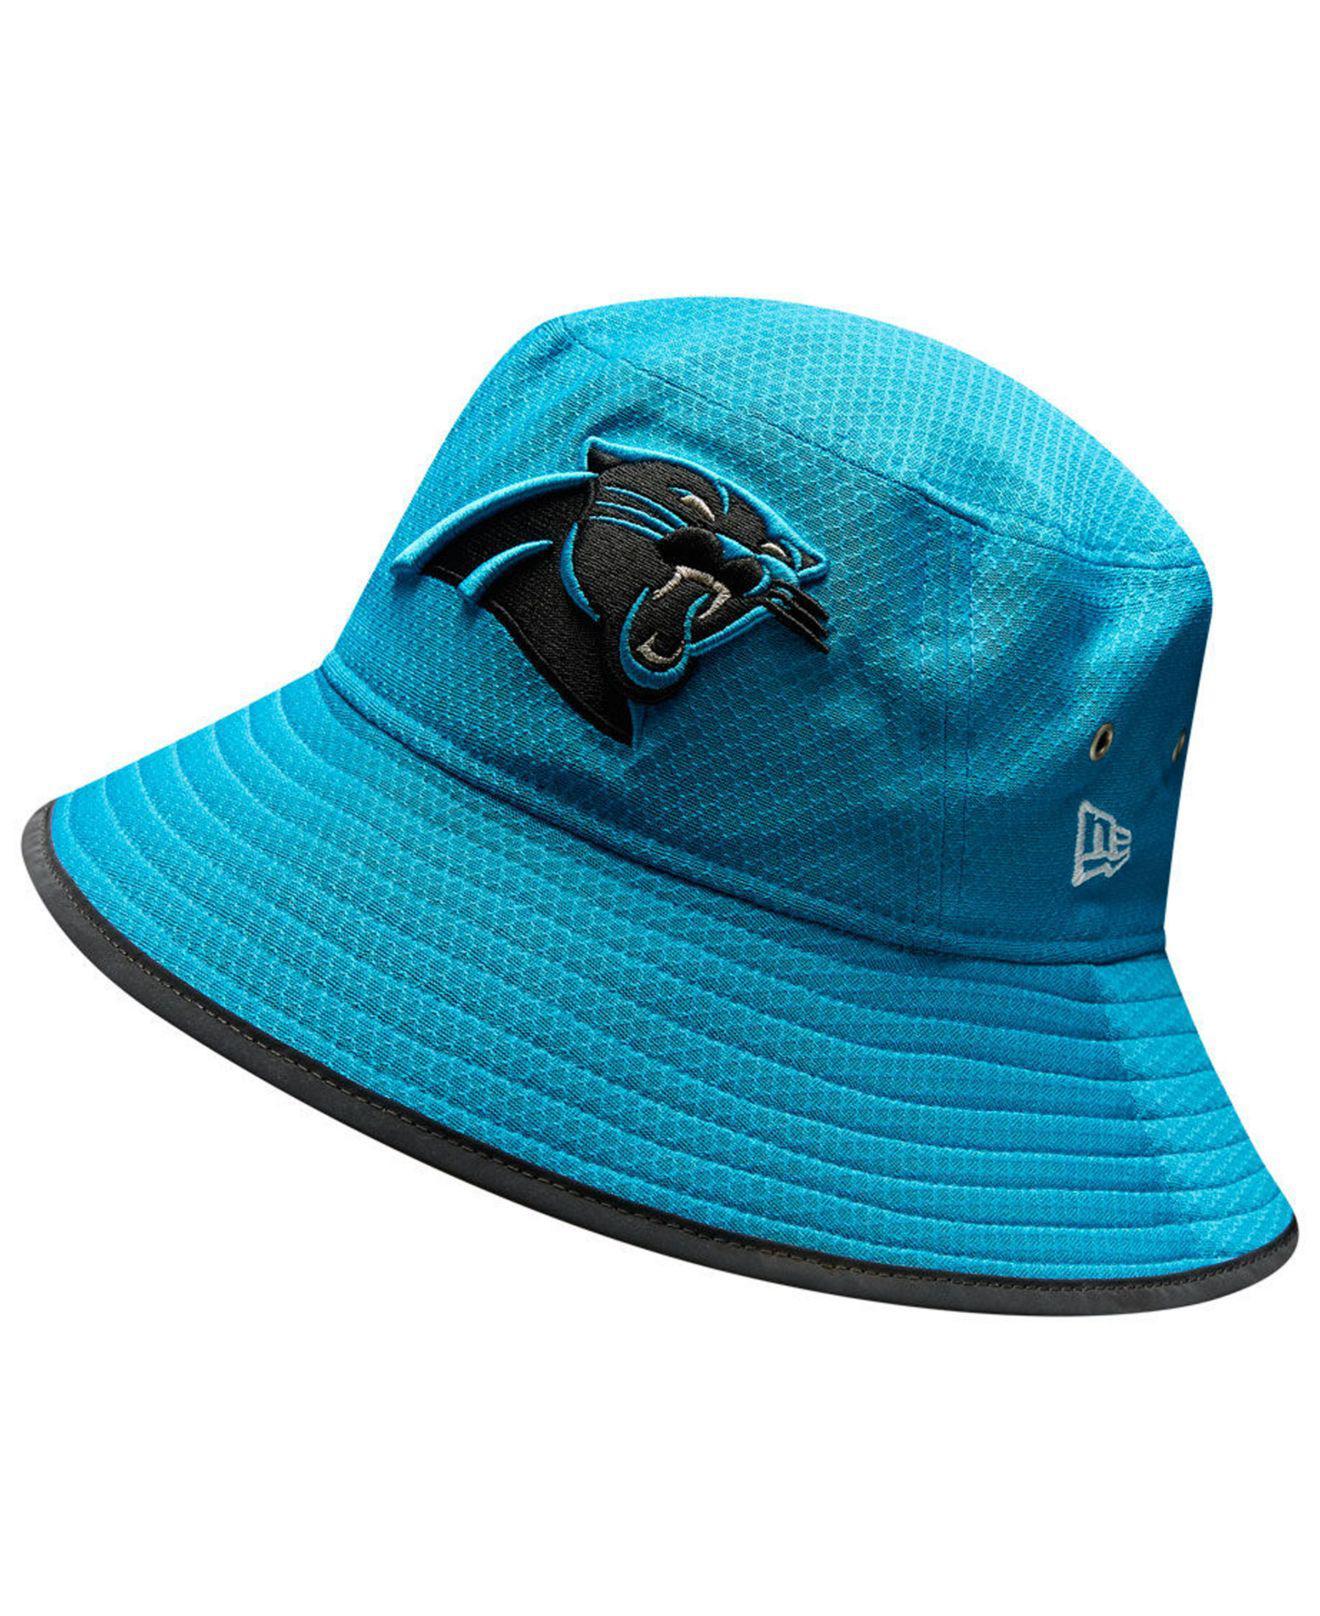 Lyst - Ktz Carolina Panthers Training Bucket Hat in Blue 297509ade